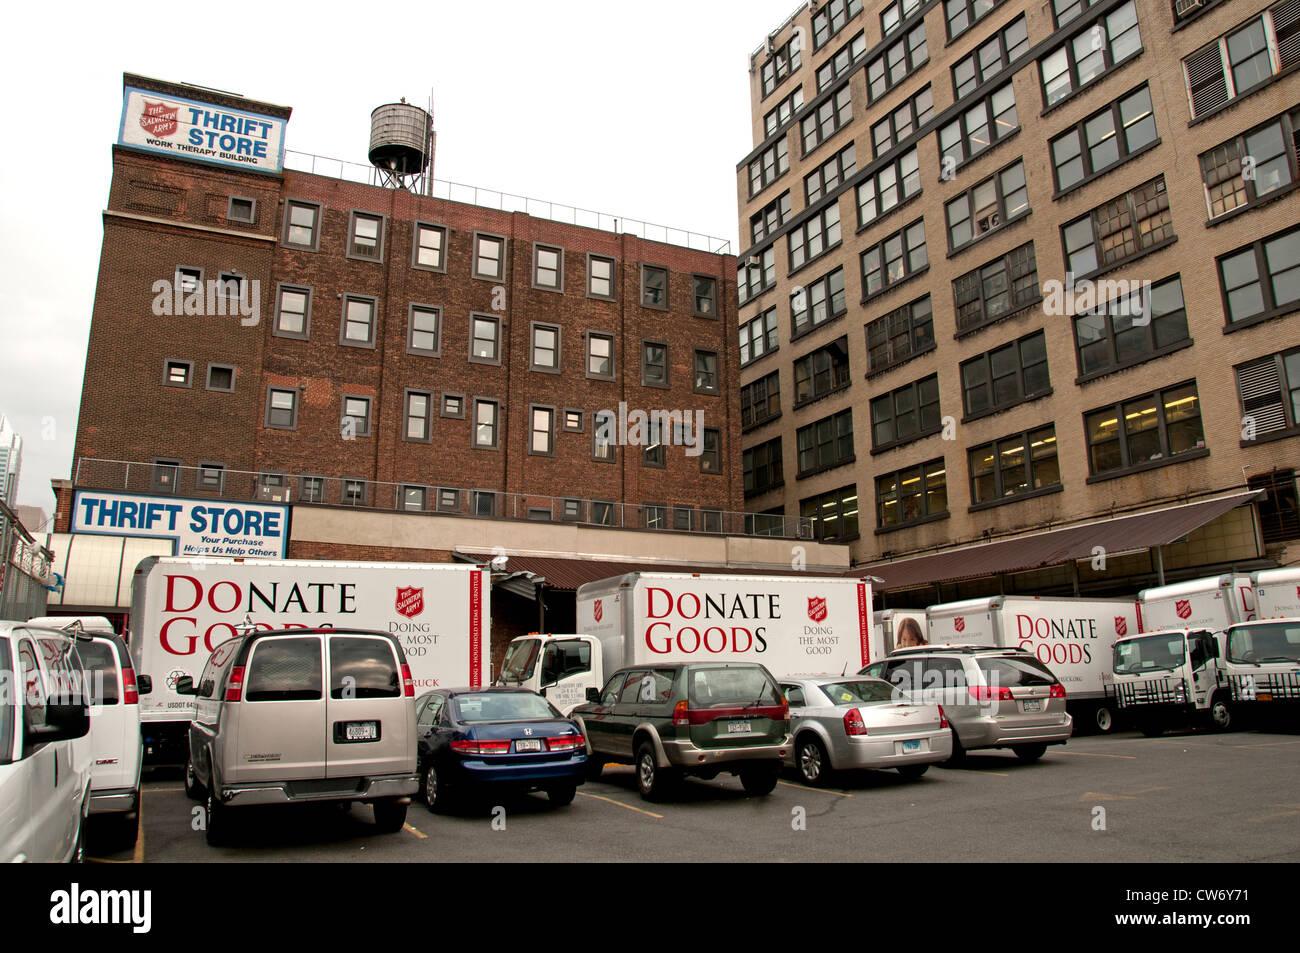 Salvation Army Thrift Store Donate Goods New York City Manhattan - Stock Image